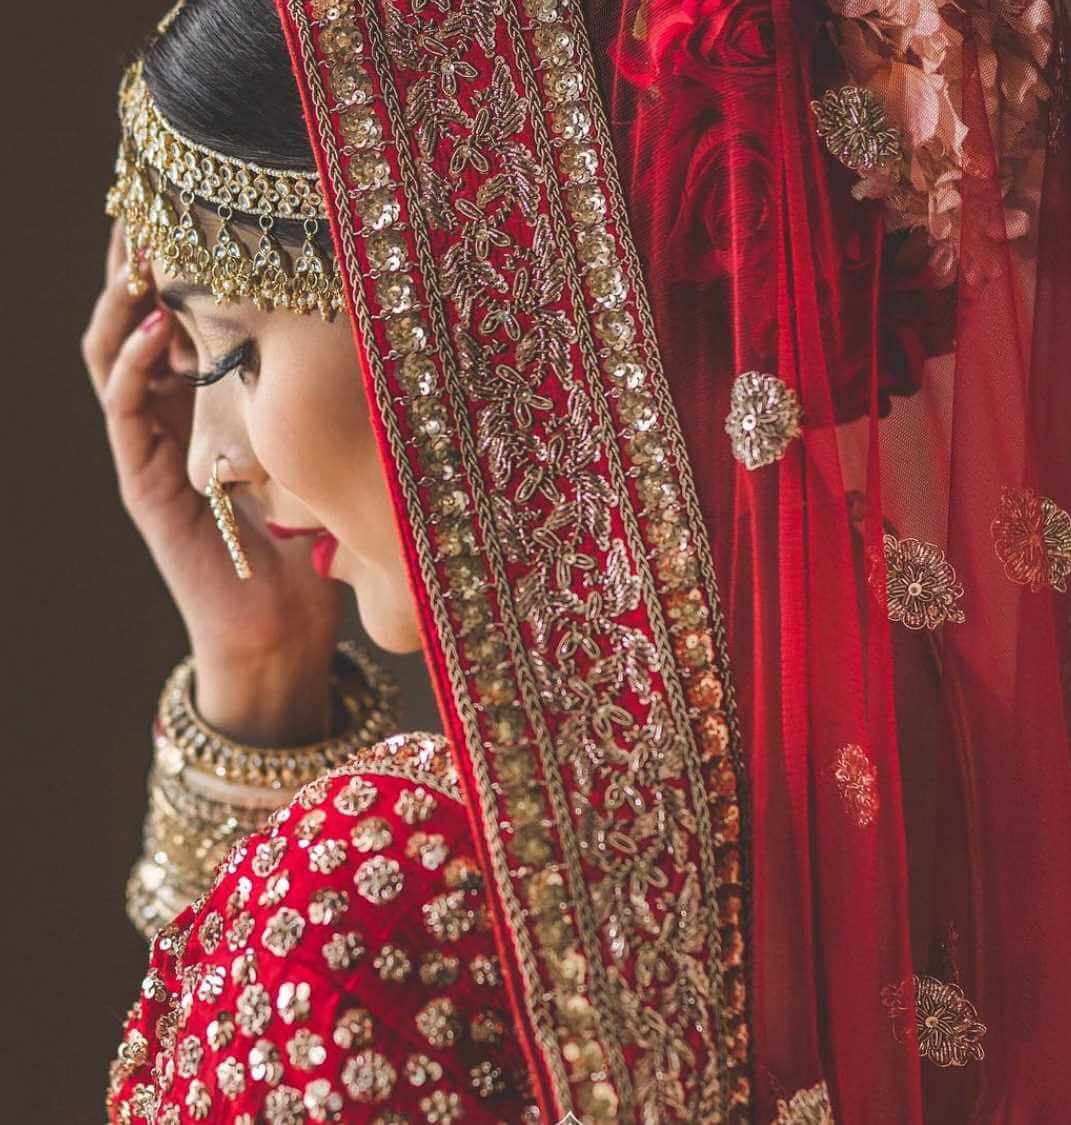 Mehazabien Chowdhury Wedding Picture 2021